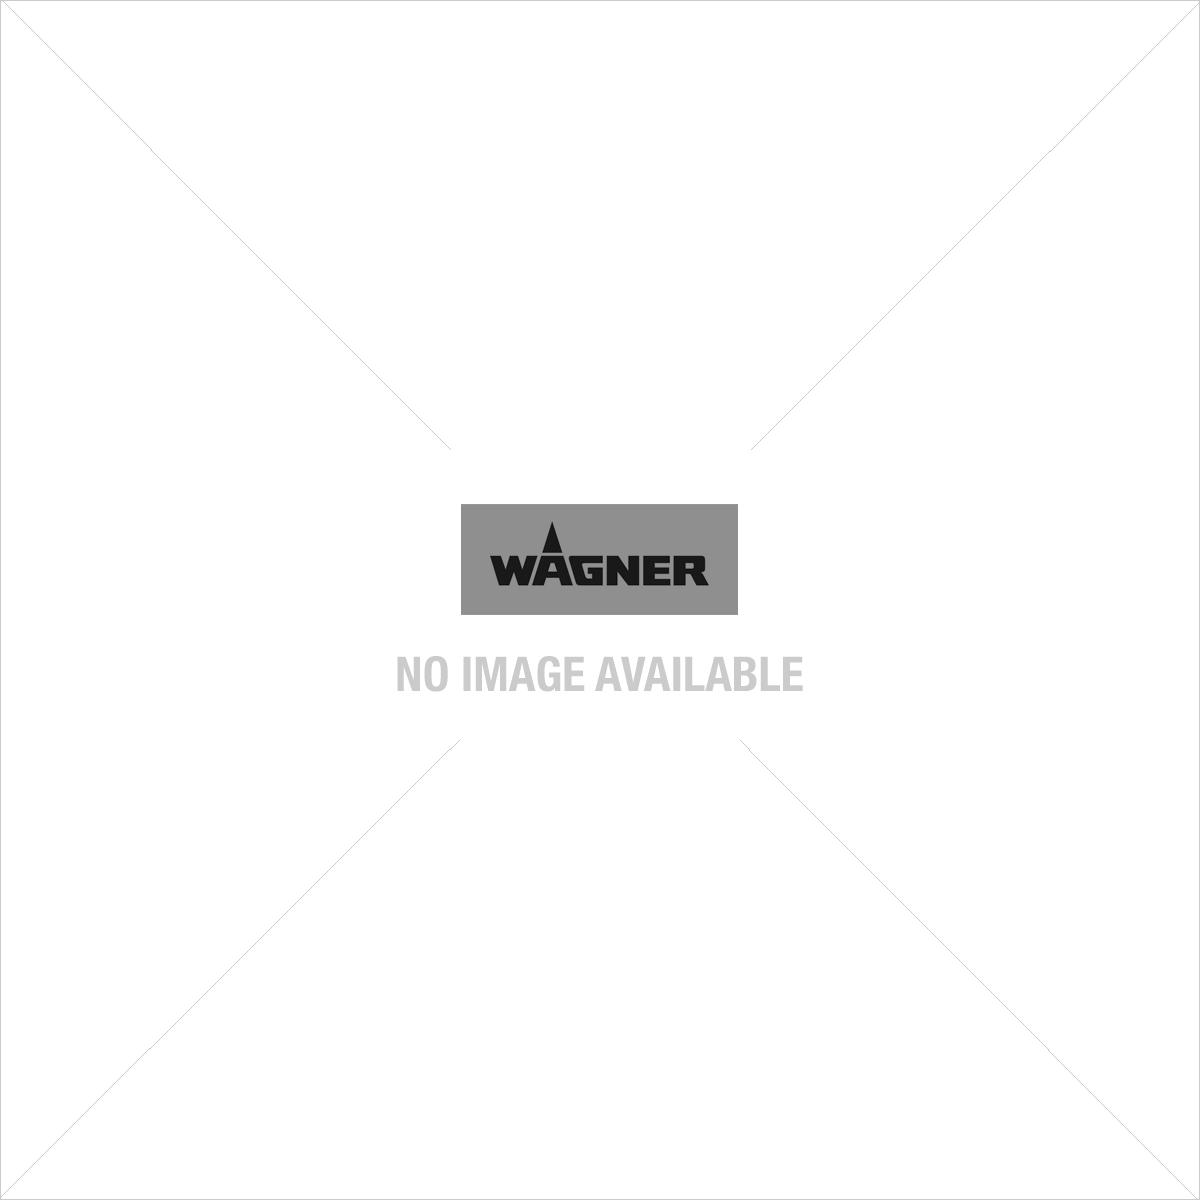 Wagner Airless Sprayer Plus Paint Sprayer